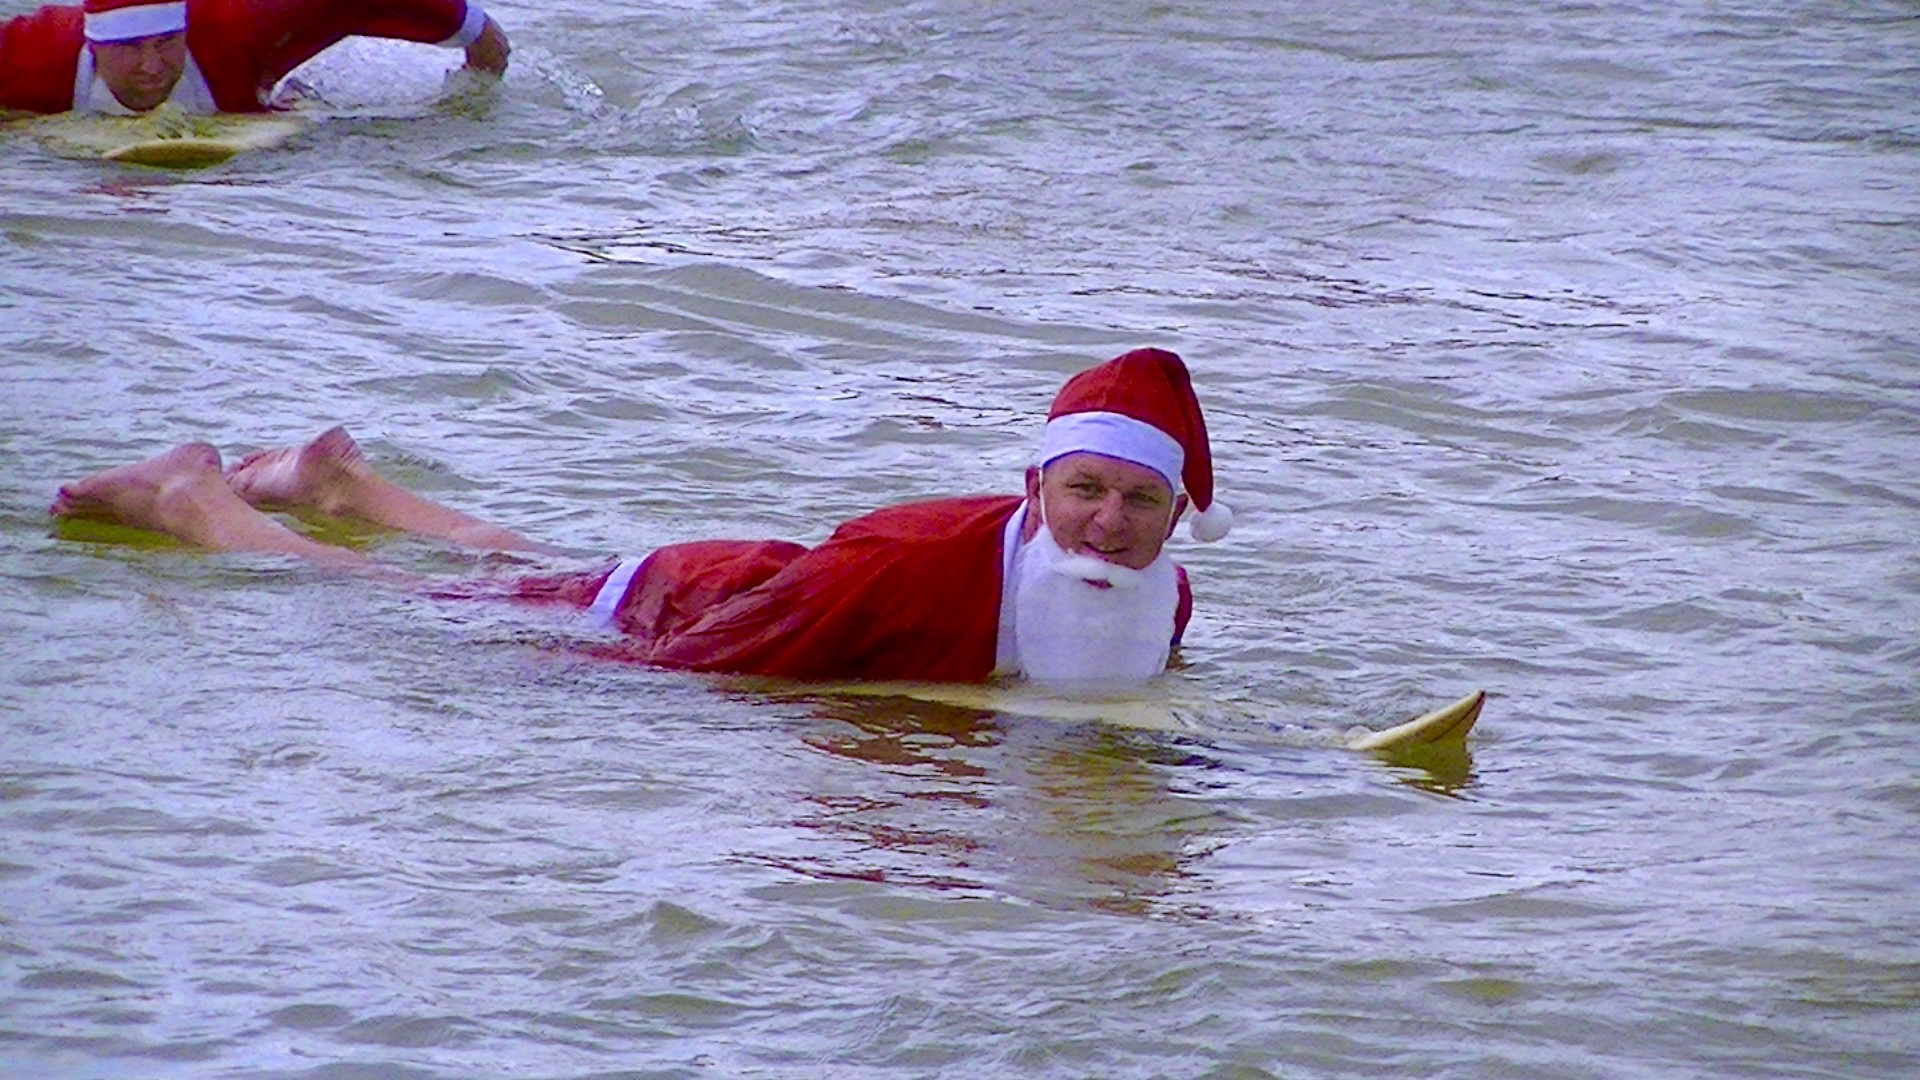 Lee at the Cresent Head Santa Surf 2014